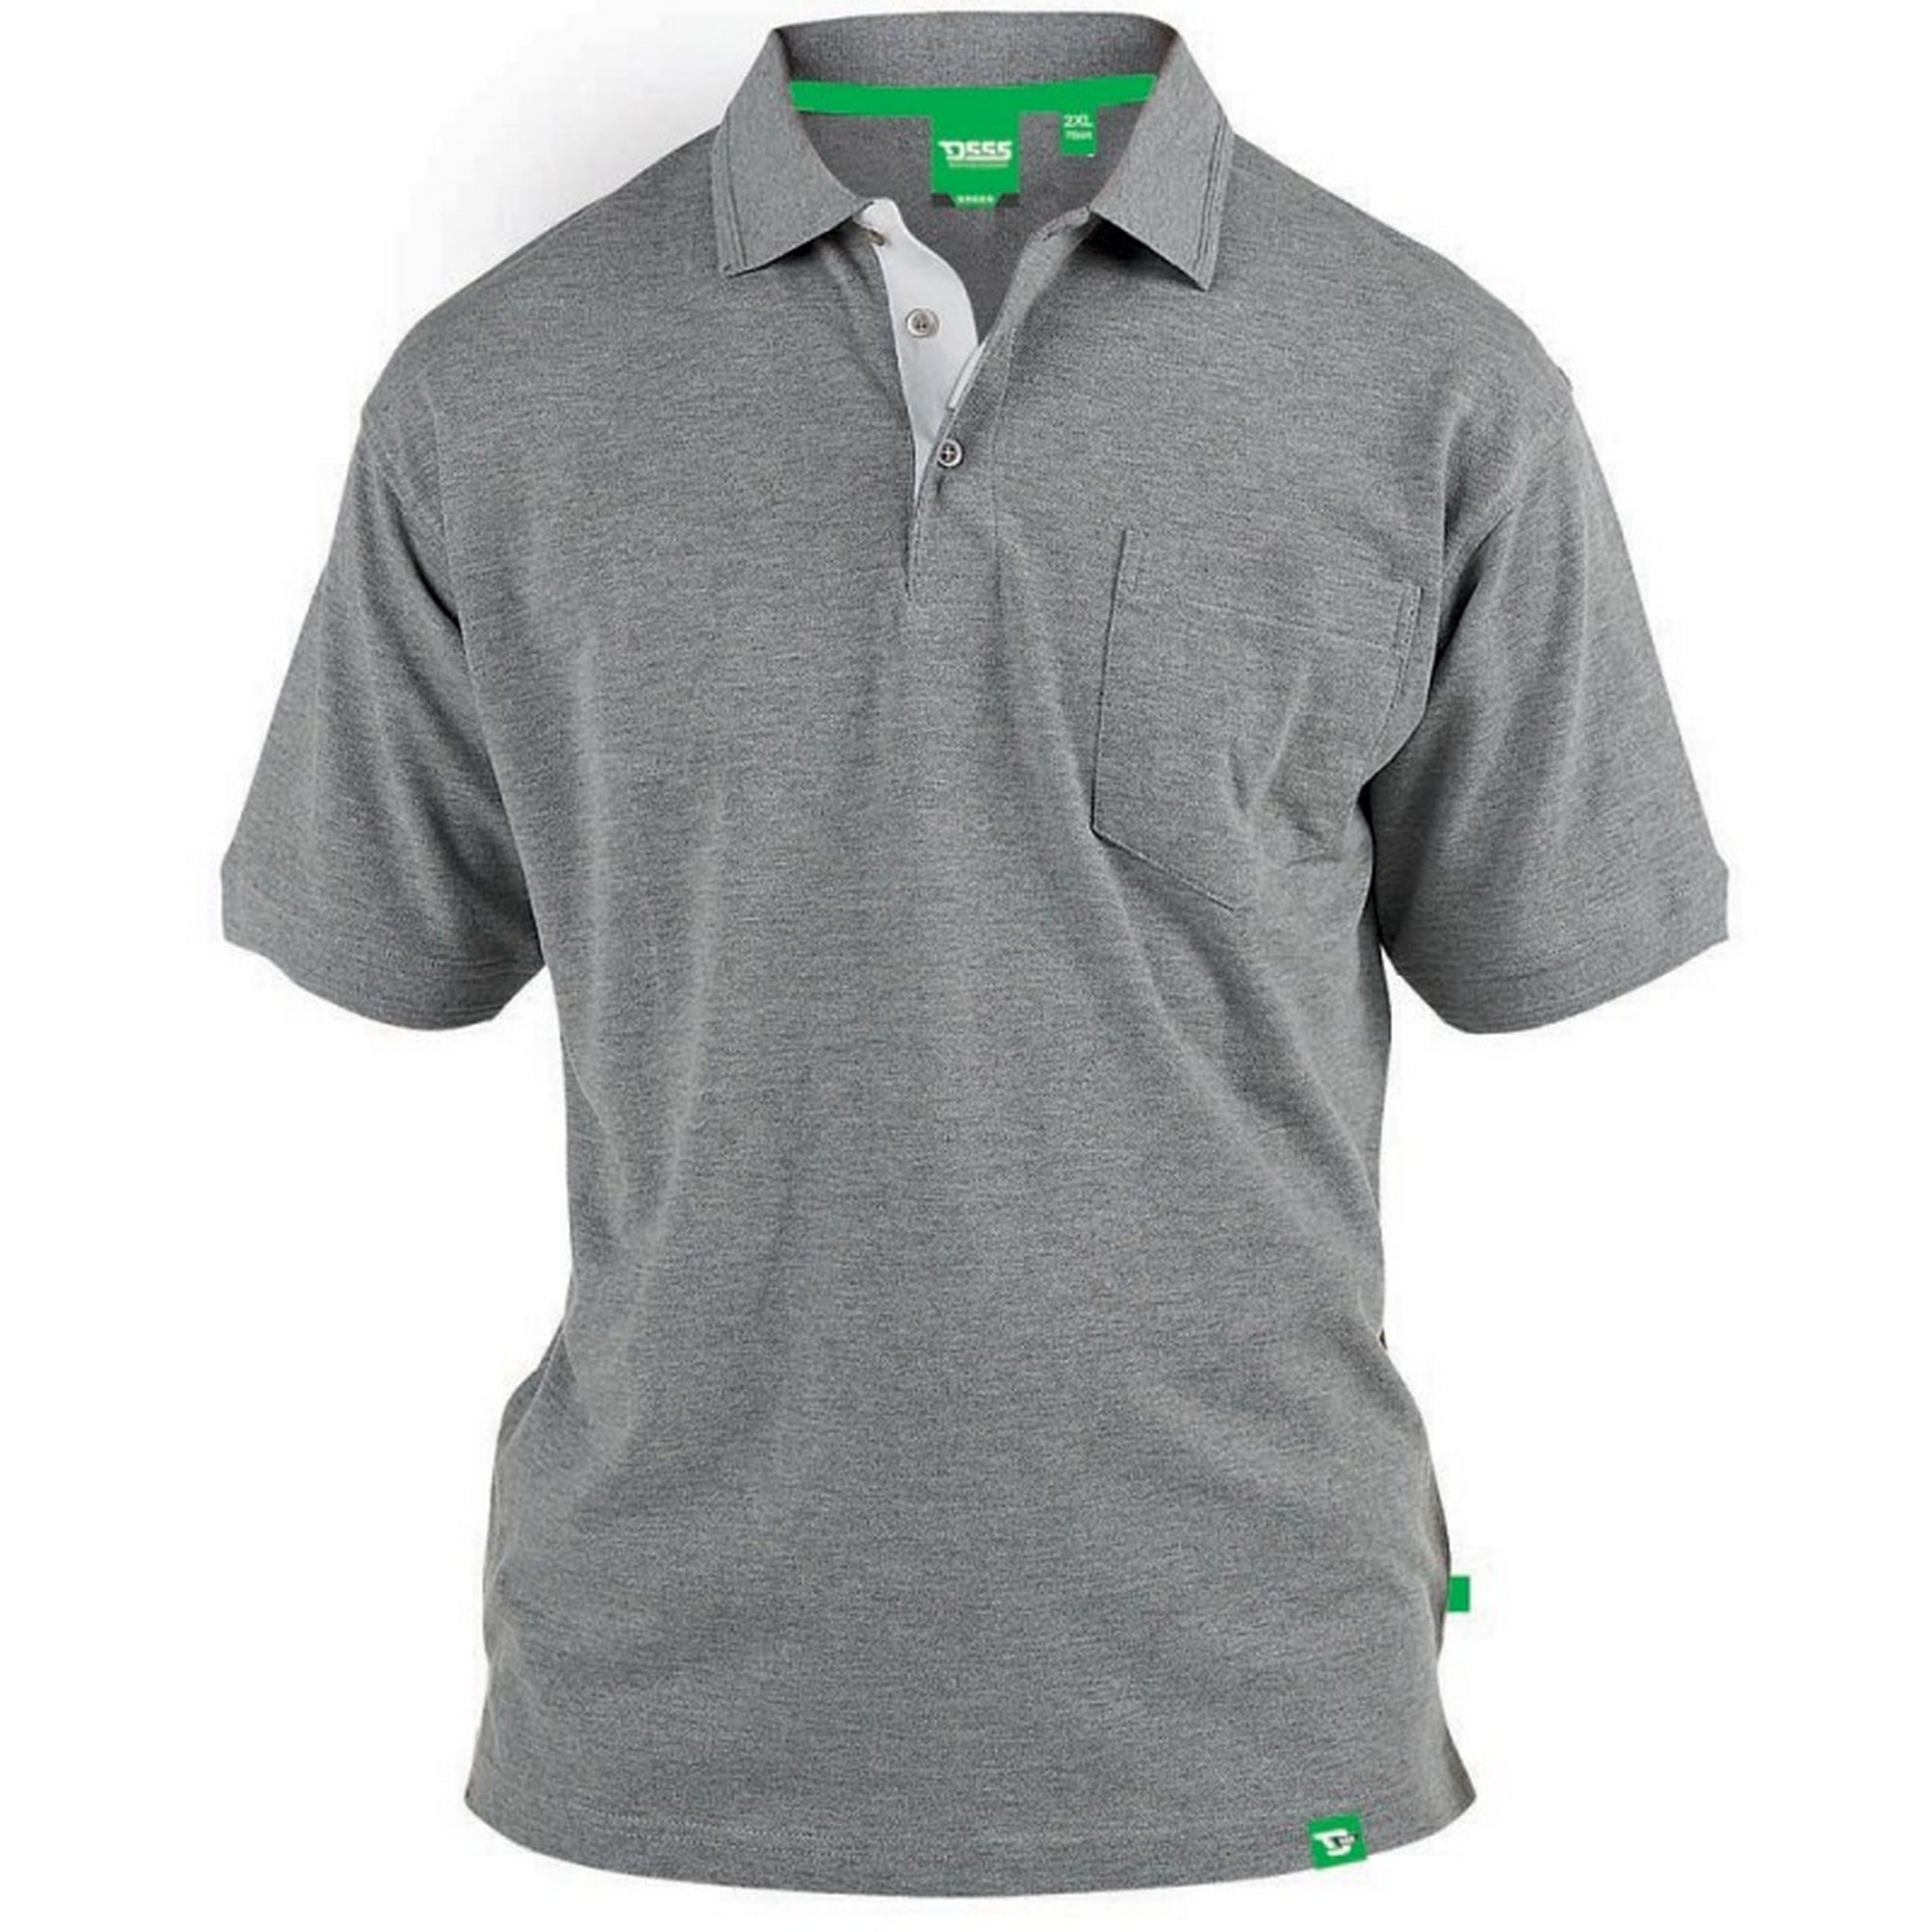 Duke Clothing Poloshirt Herren D555 Kingsize Pique- Grant | Bekleidung > Polo Shirts > Kurzarm | Grau | Duke Clothing